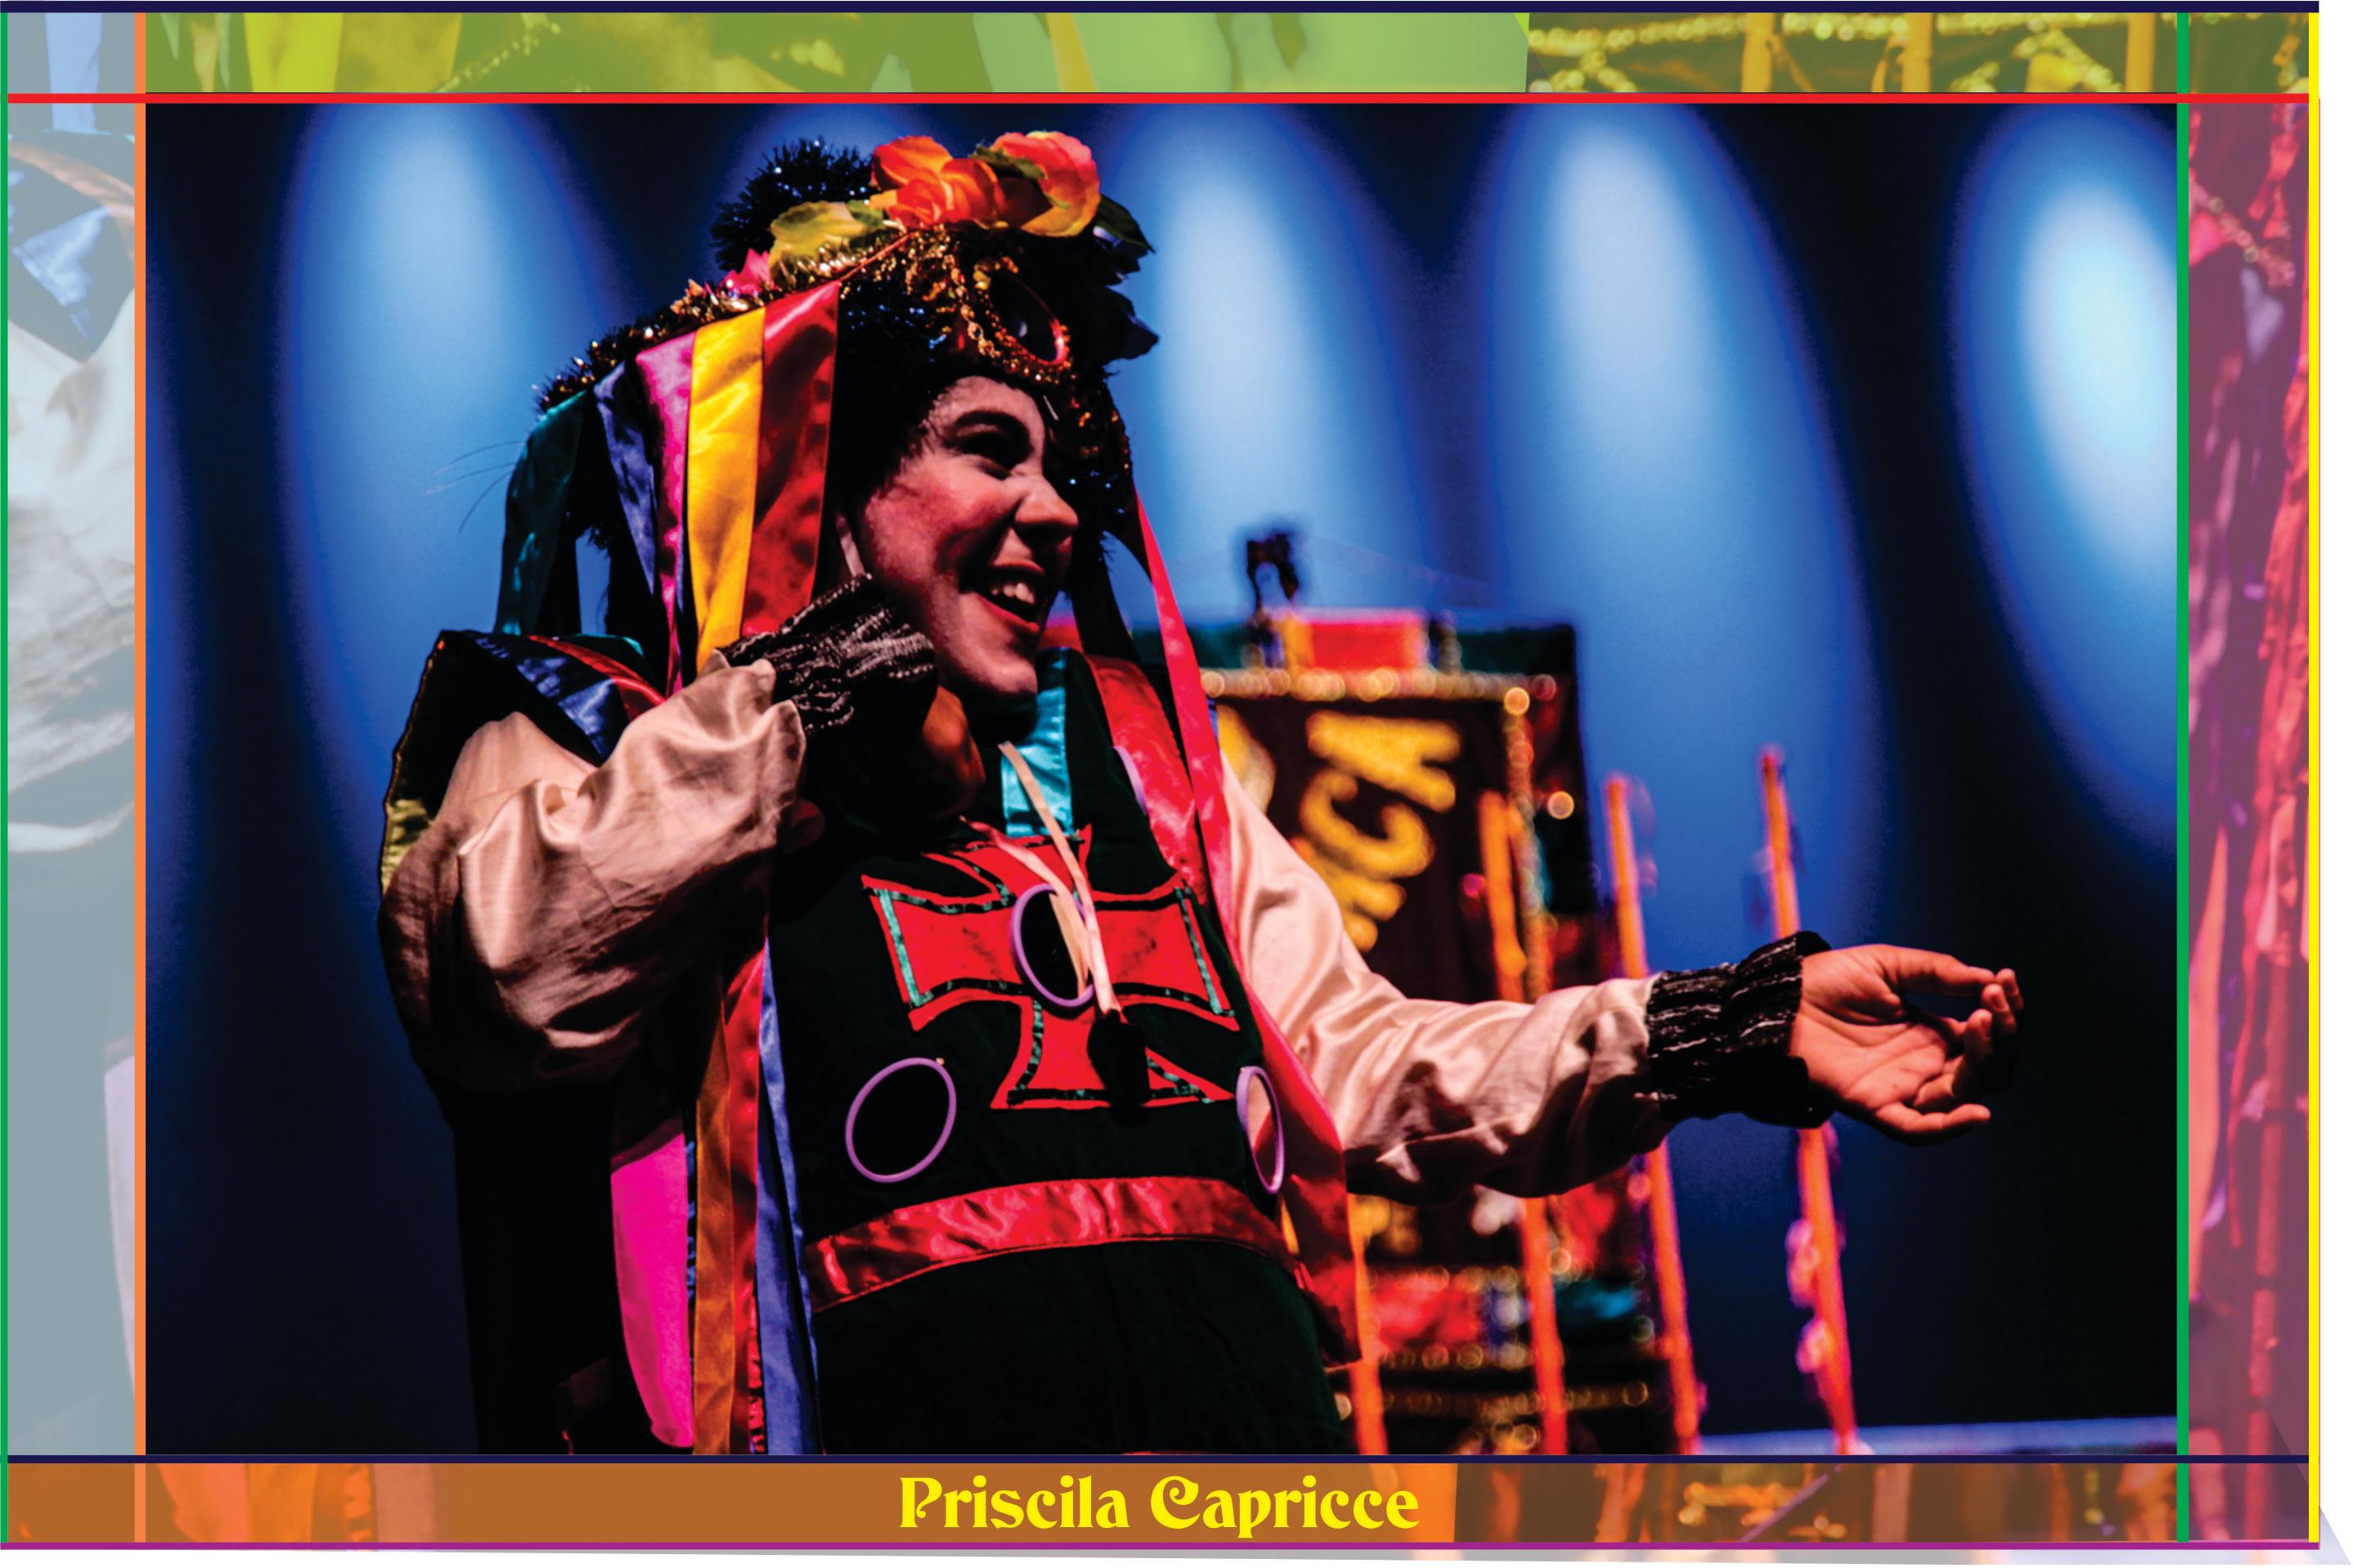 Priscila Capricce